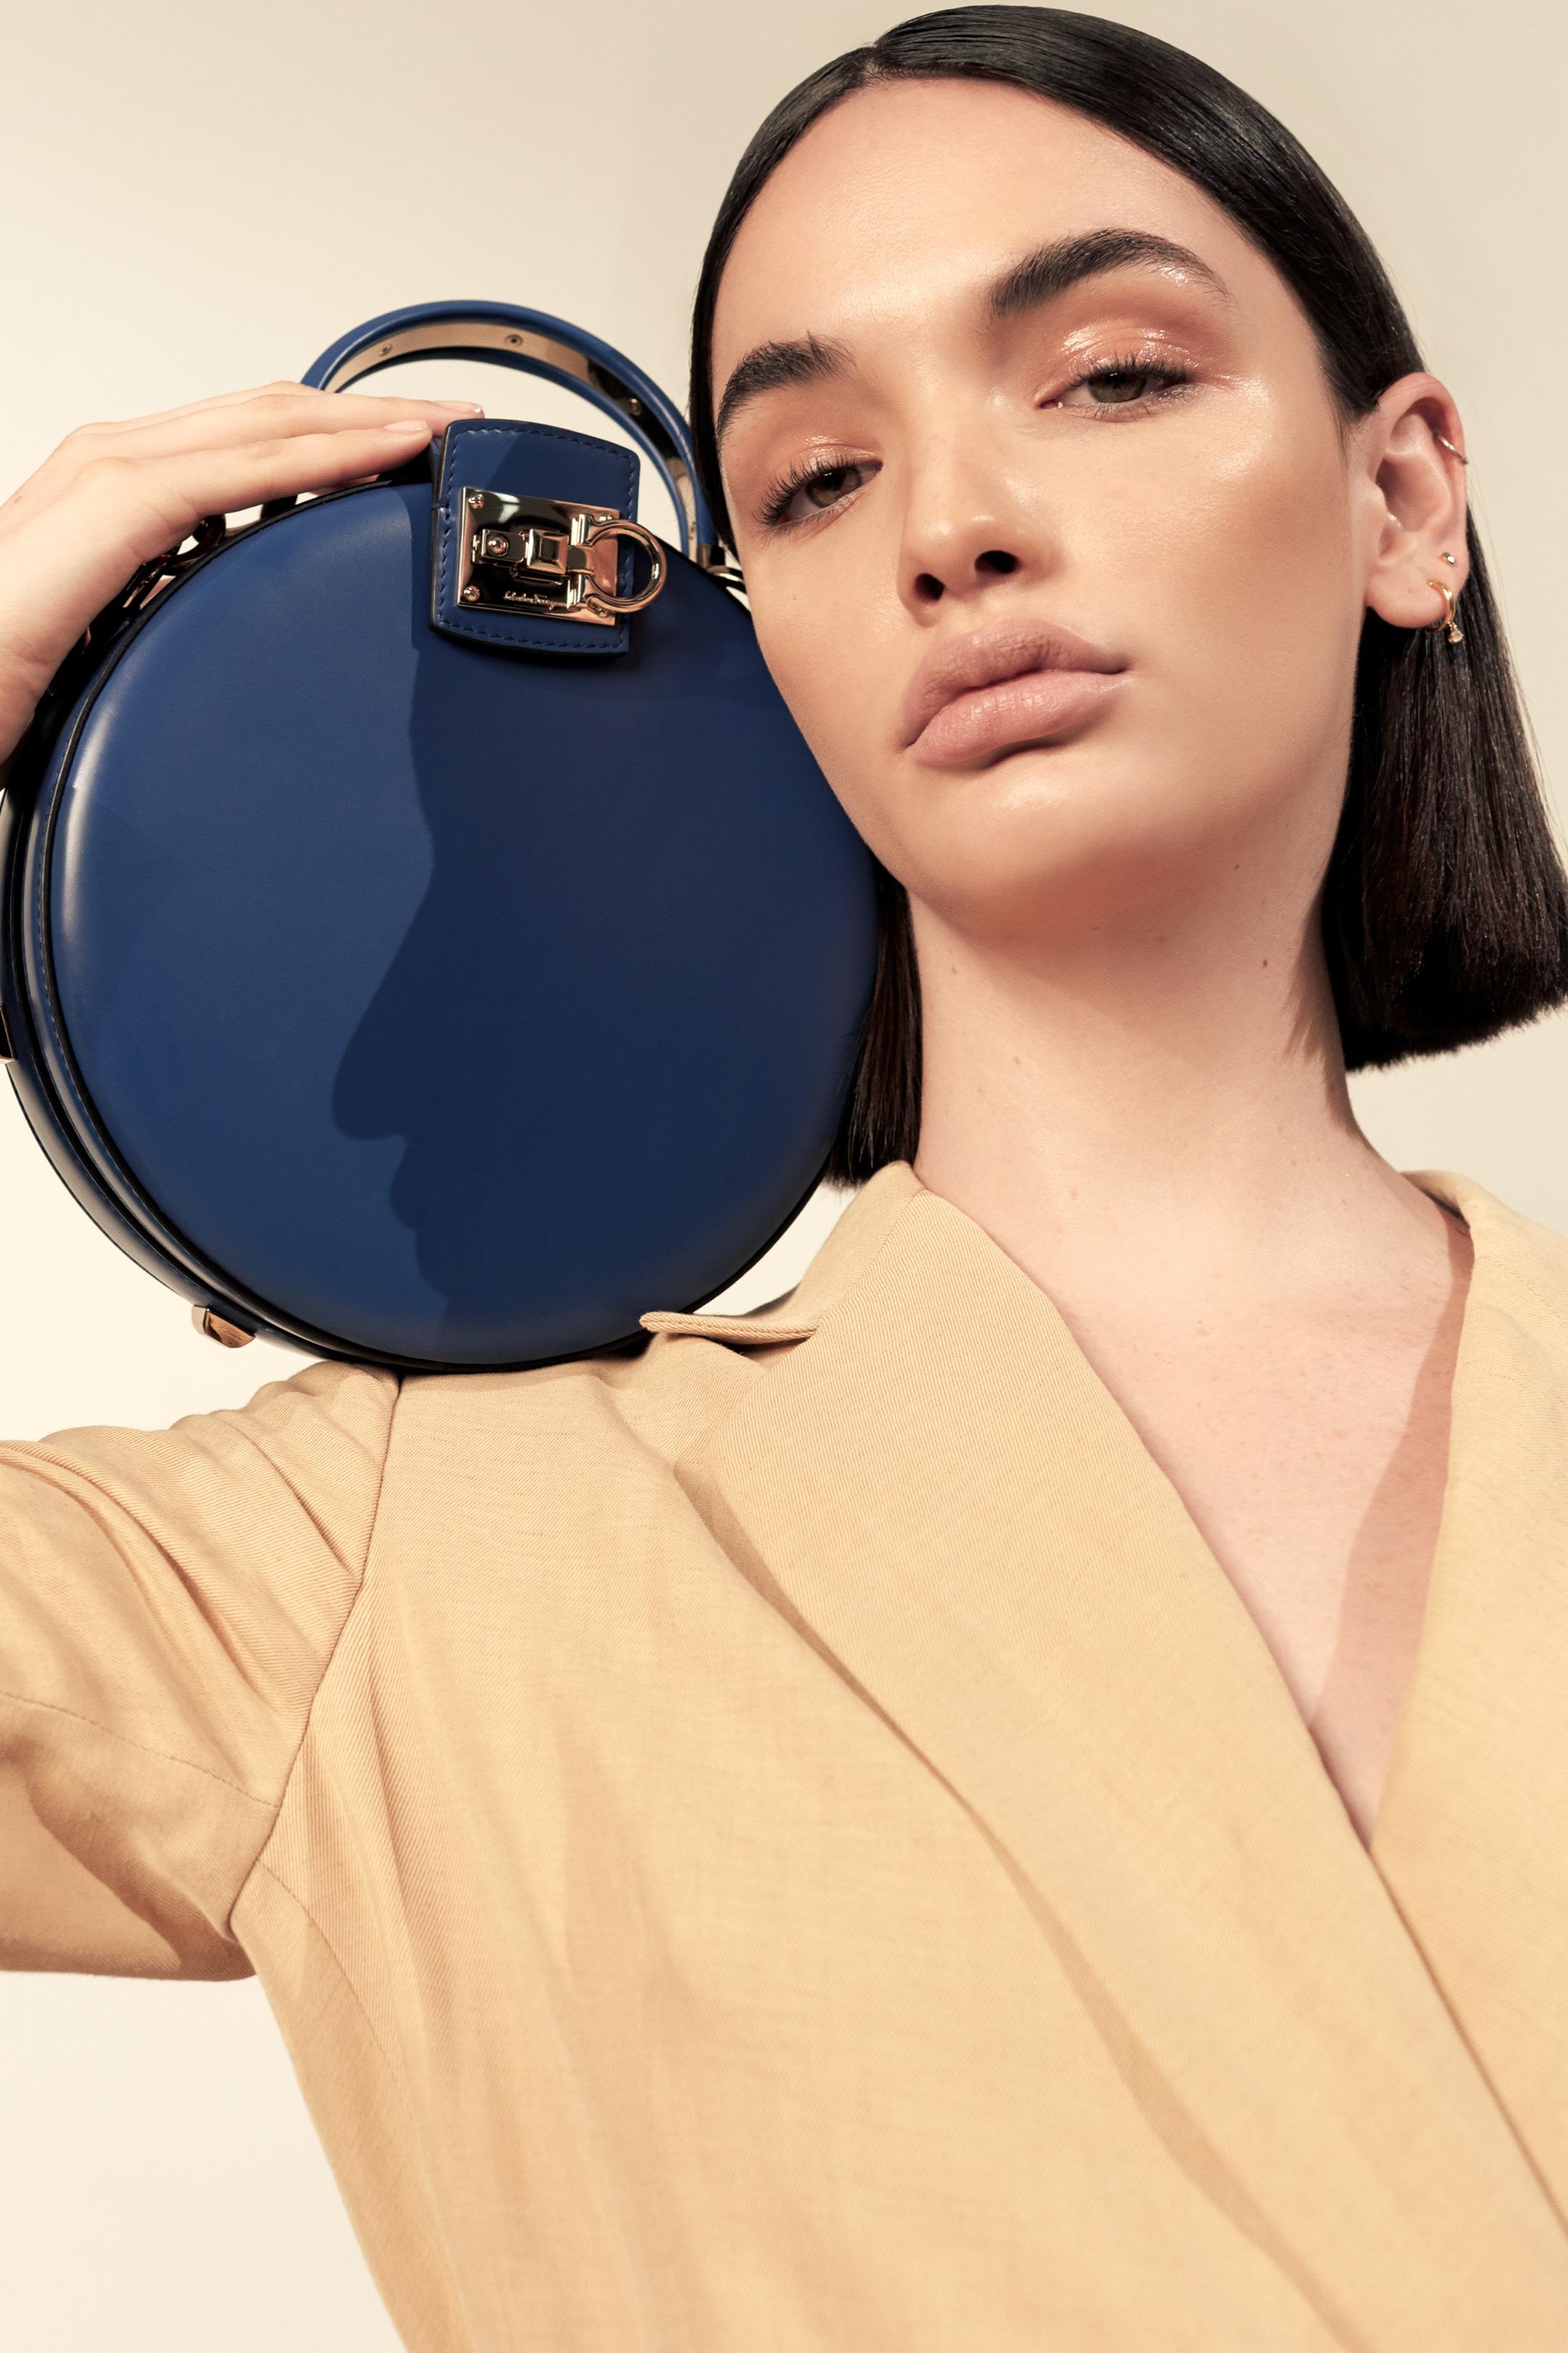 Carla Martinez for Elle Magazine | Pride Models news